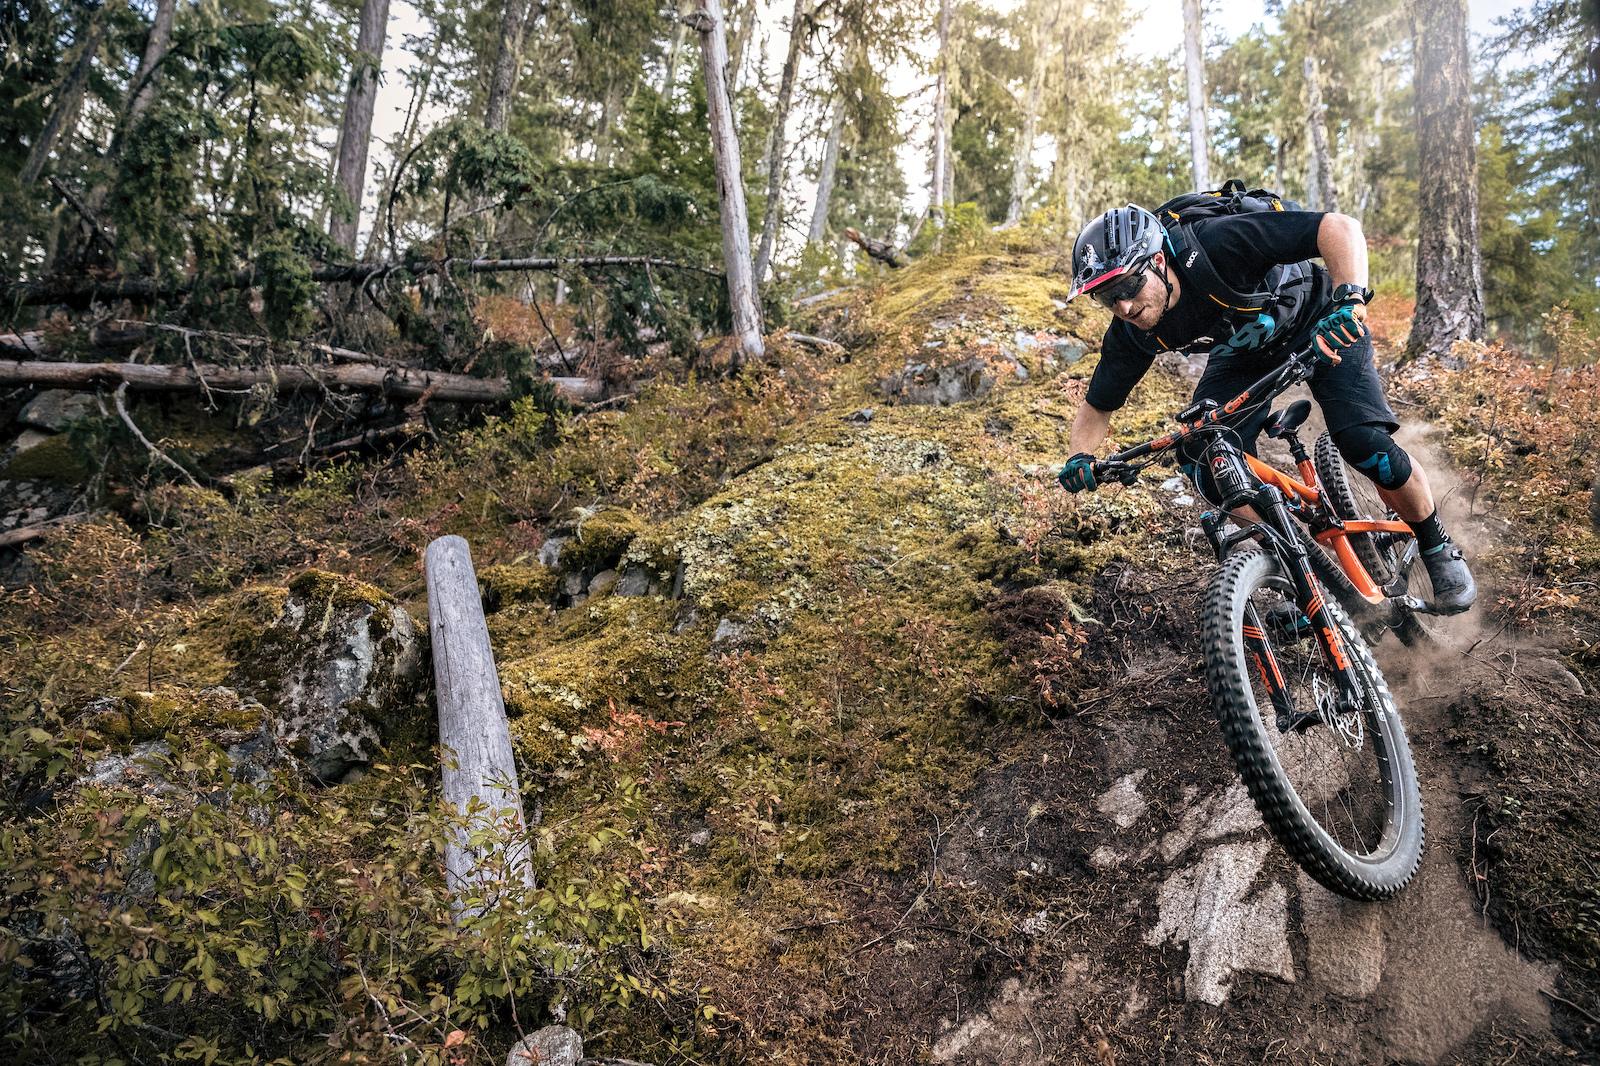 www.bikes.com pipeline